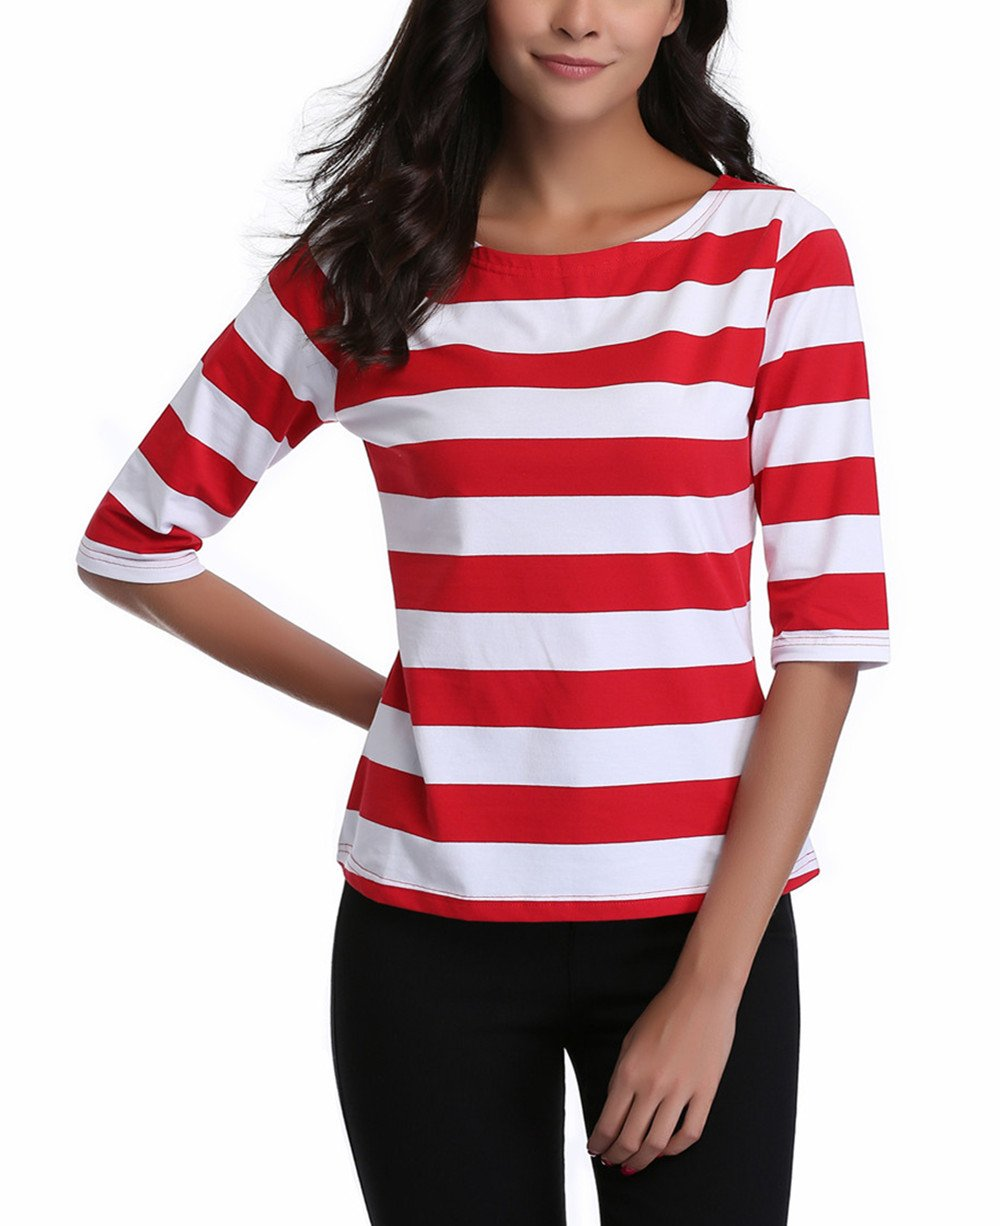 MISS MOLY SHIRT レディース B0756QVH8Q M|Red Large Stripe Red Large Stripe M